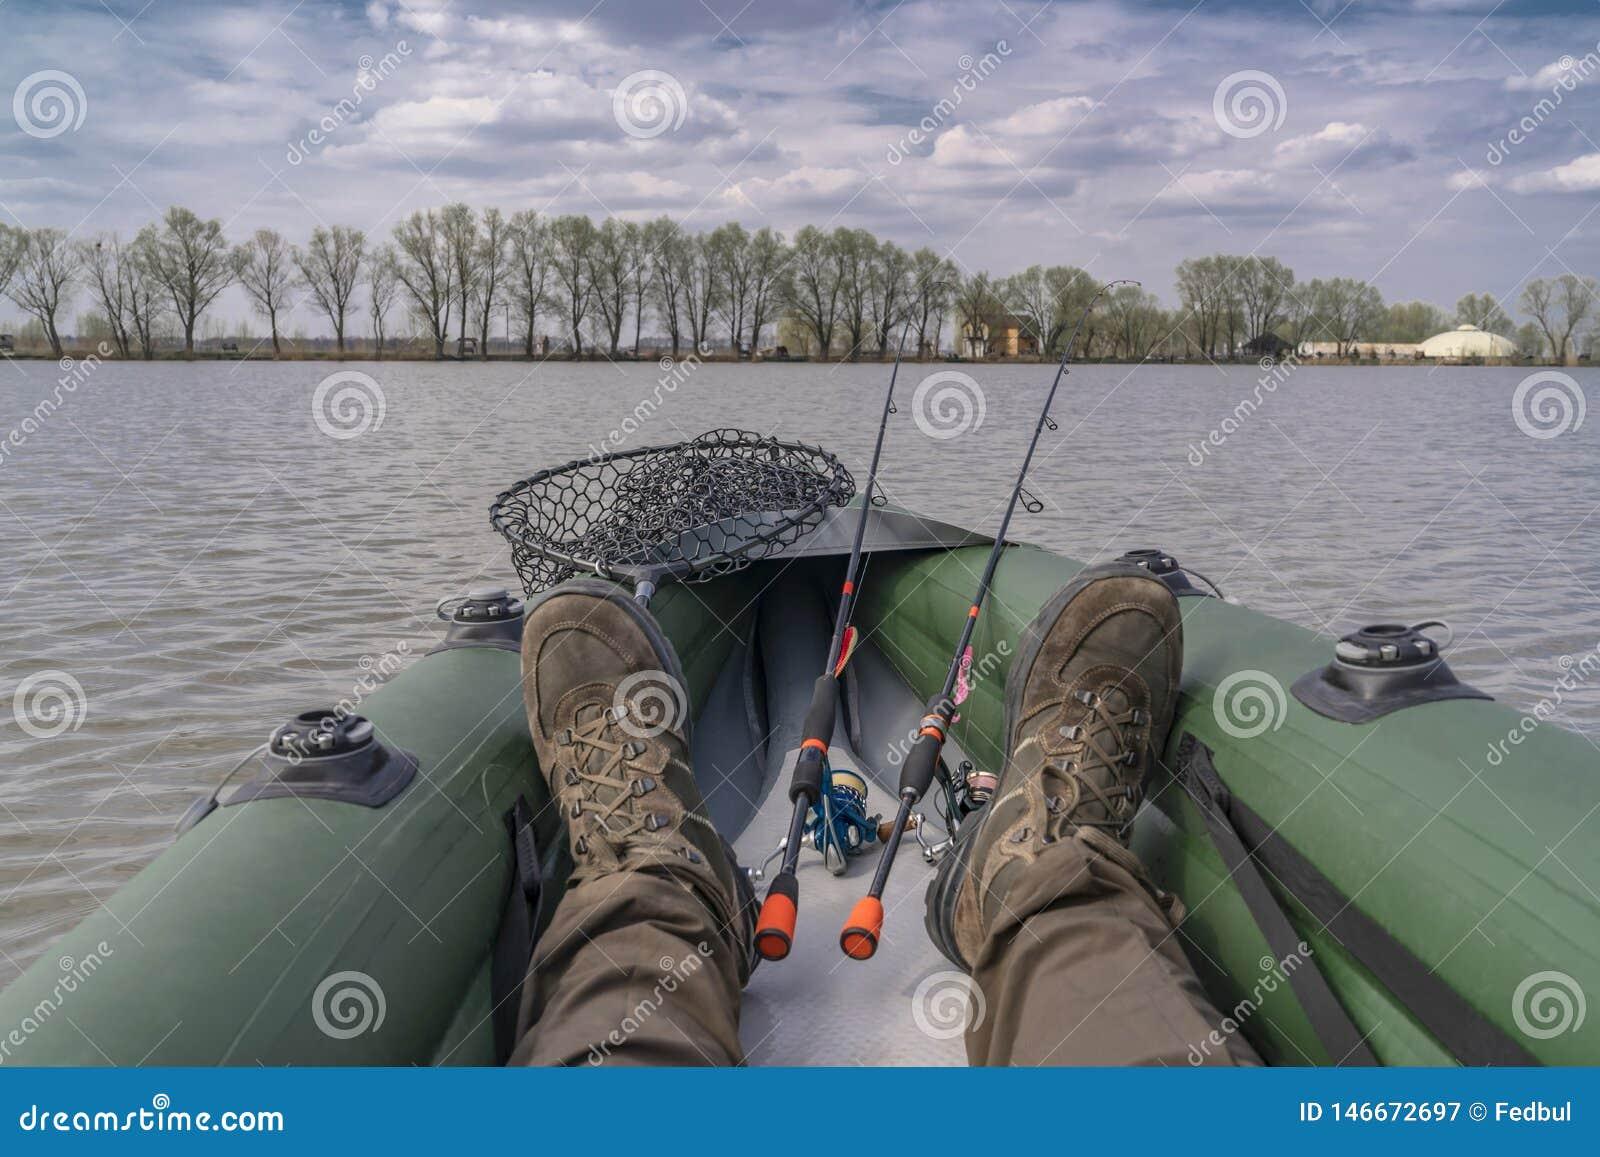 Kayak fishing at lake. Legs of fisherman on inflatable boat with fishing tackle